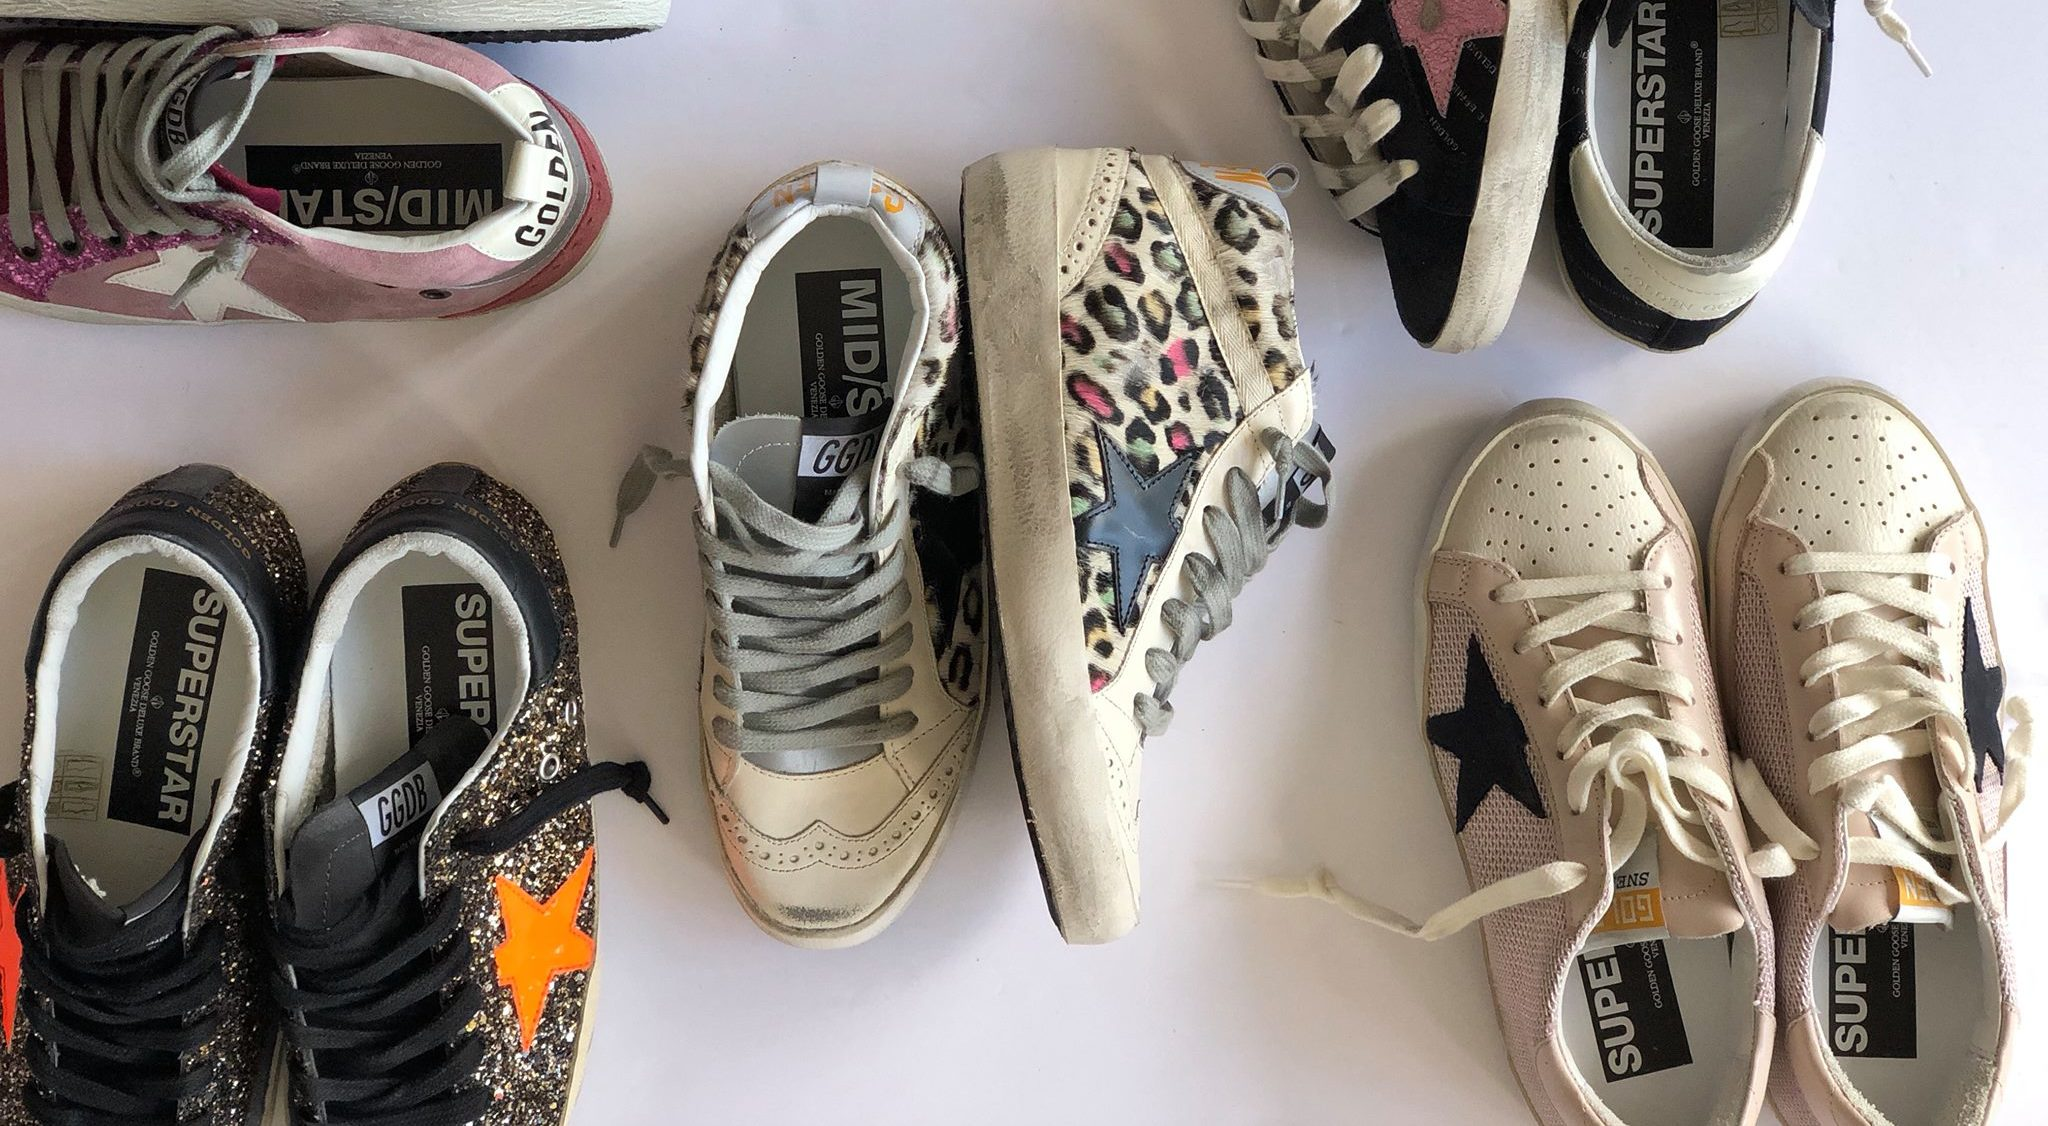 spree sale shoes